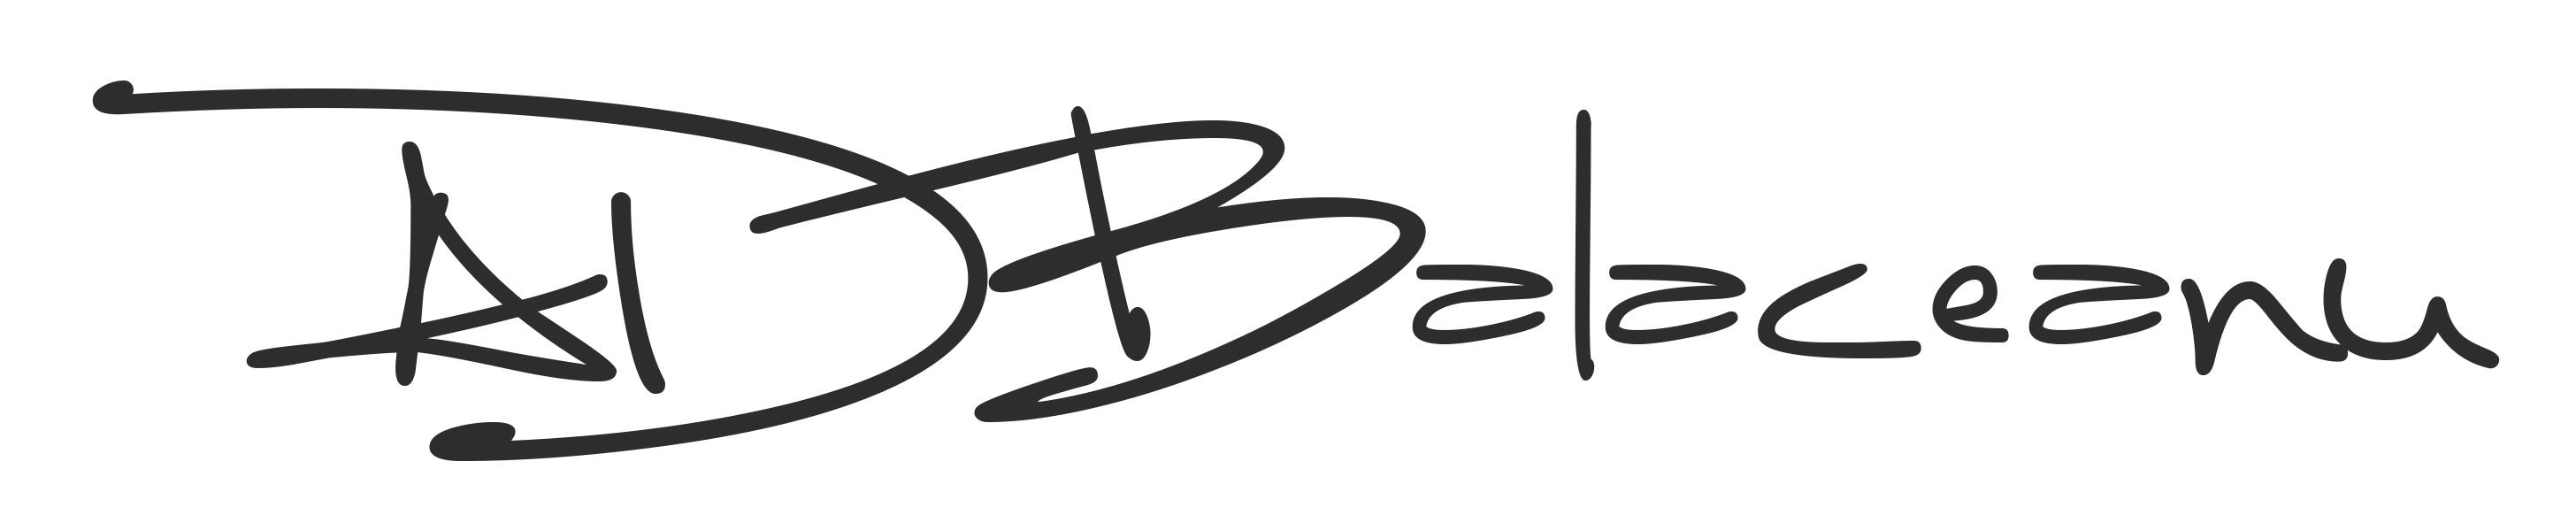 Alin Daniel Balaceanu Signature